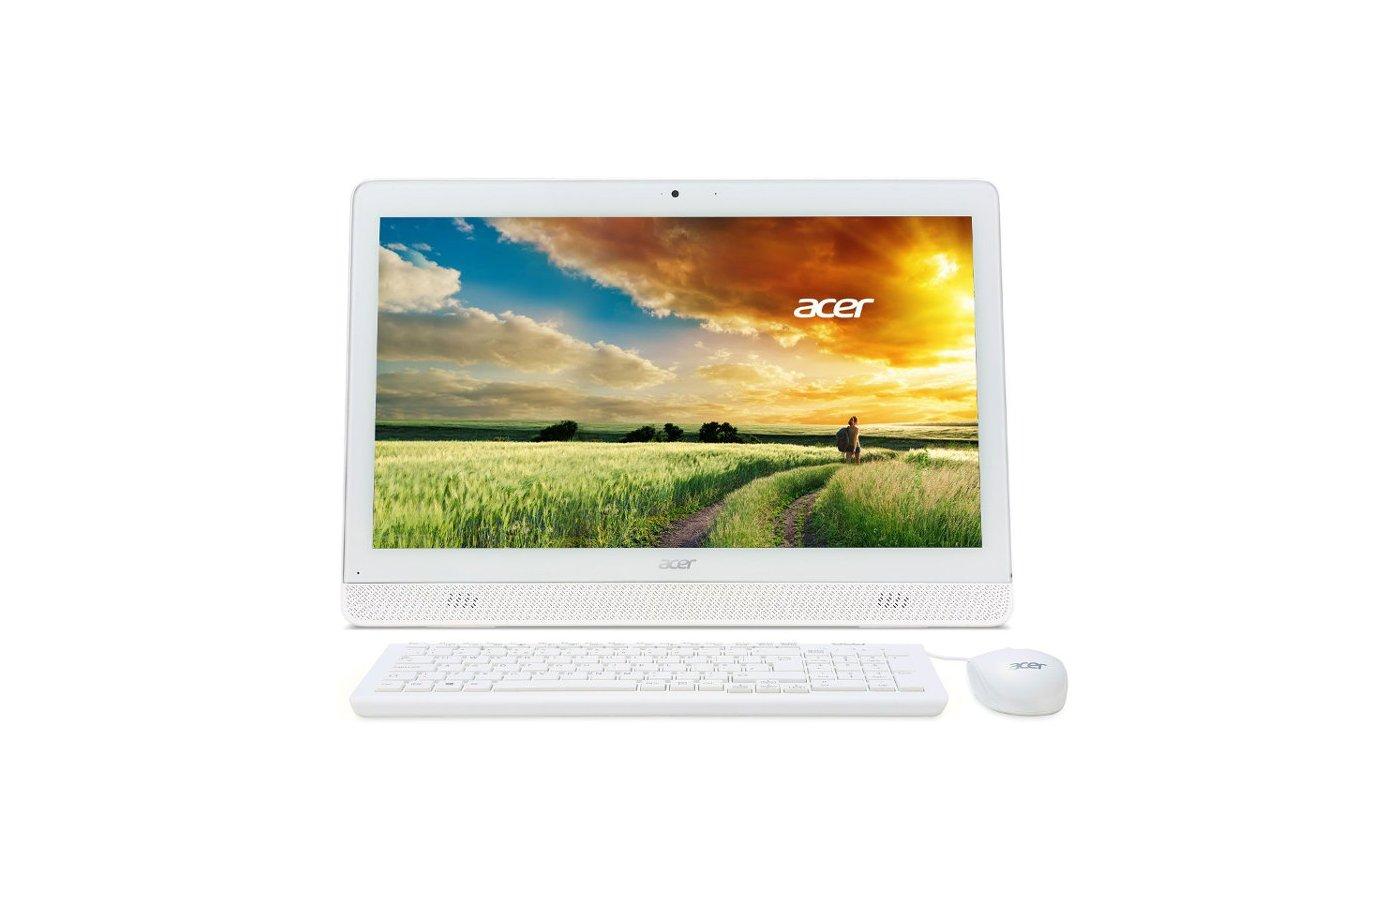 Моноблок Acer Aspire Z1-612 /DQ.B4GER.009/